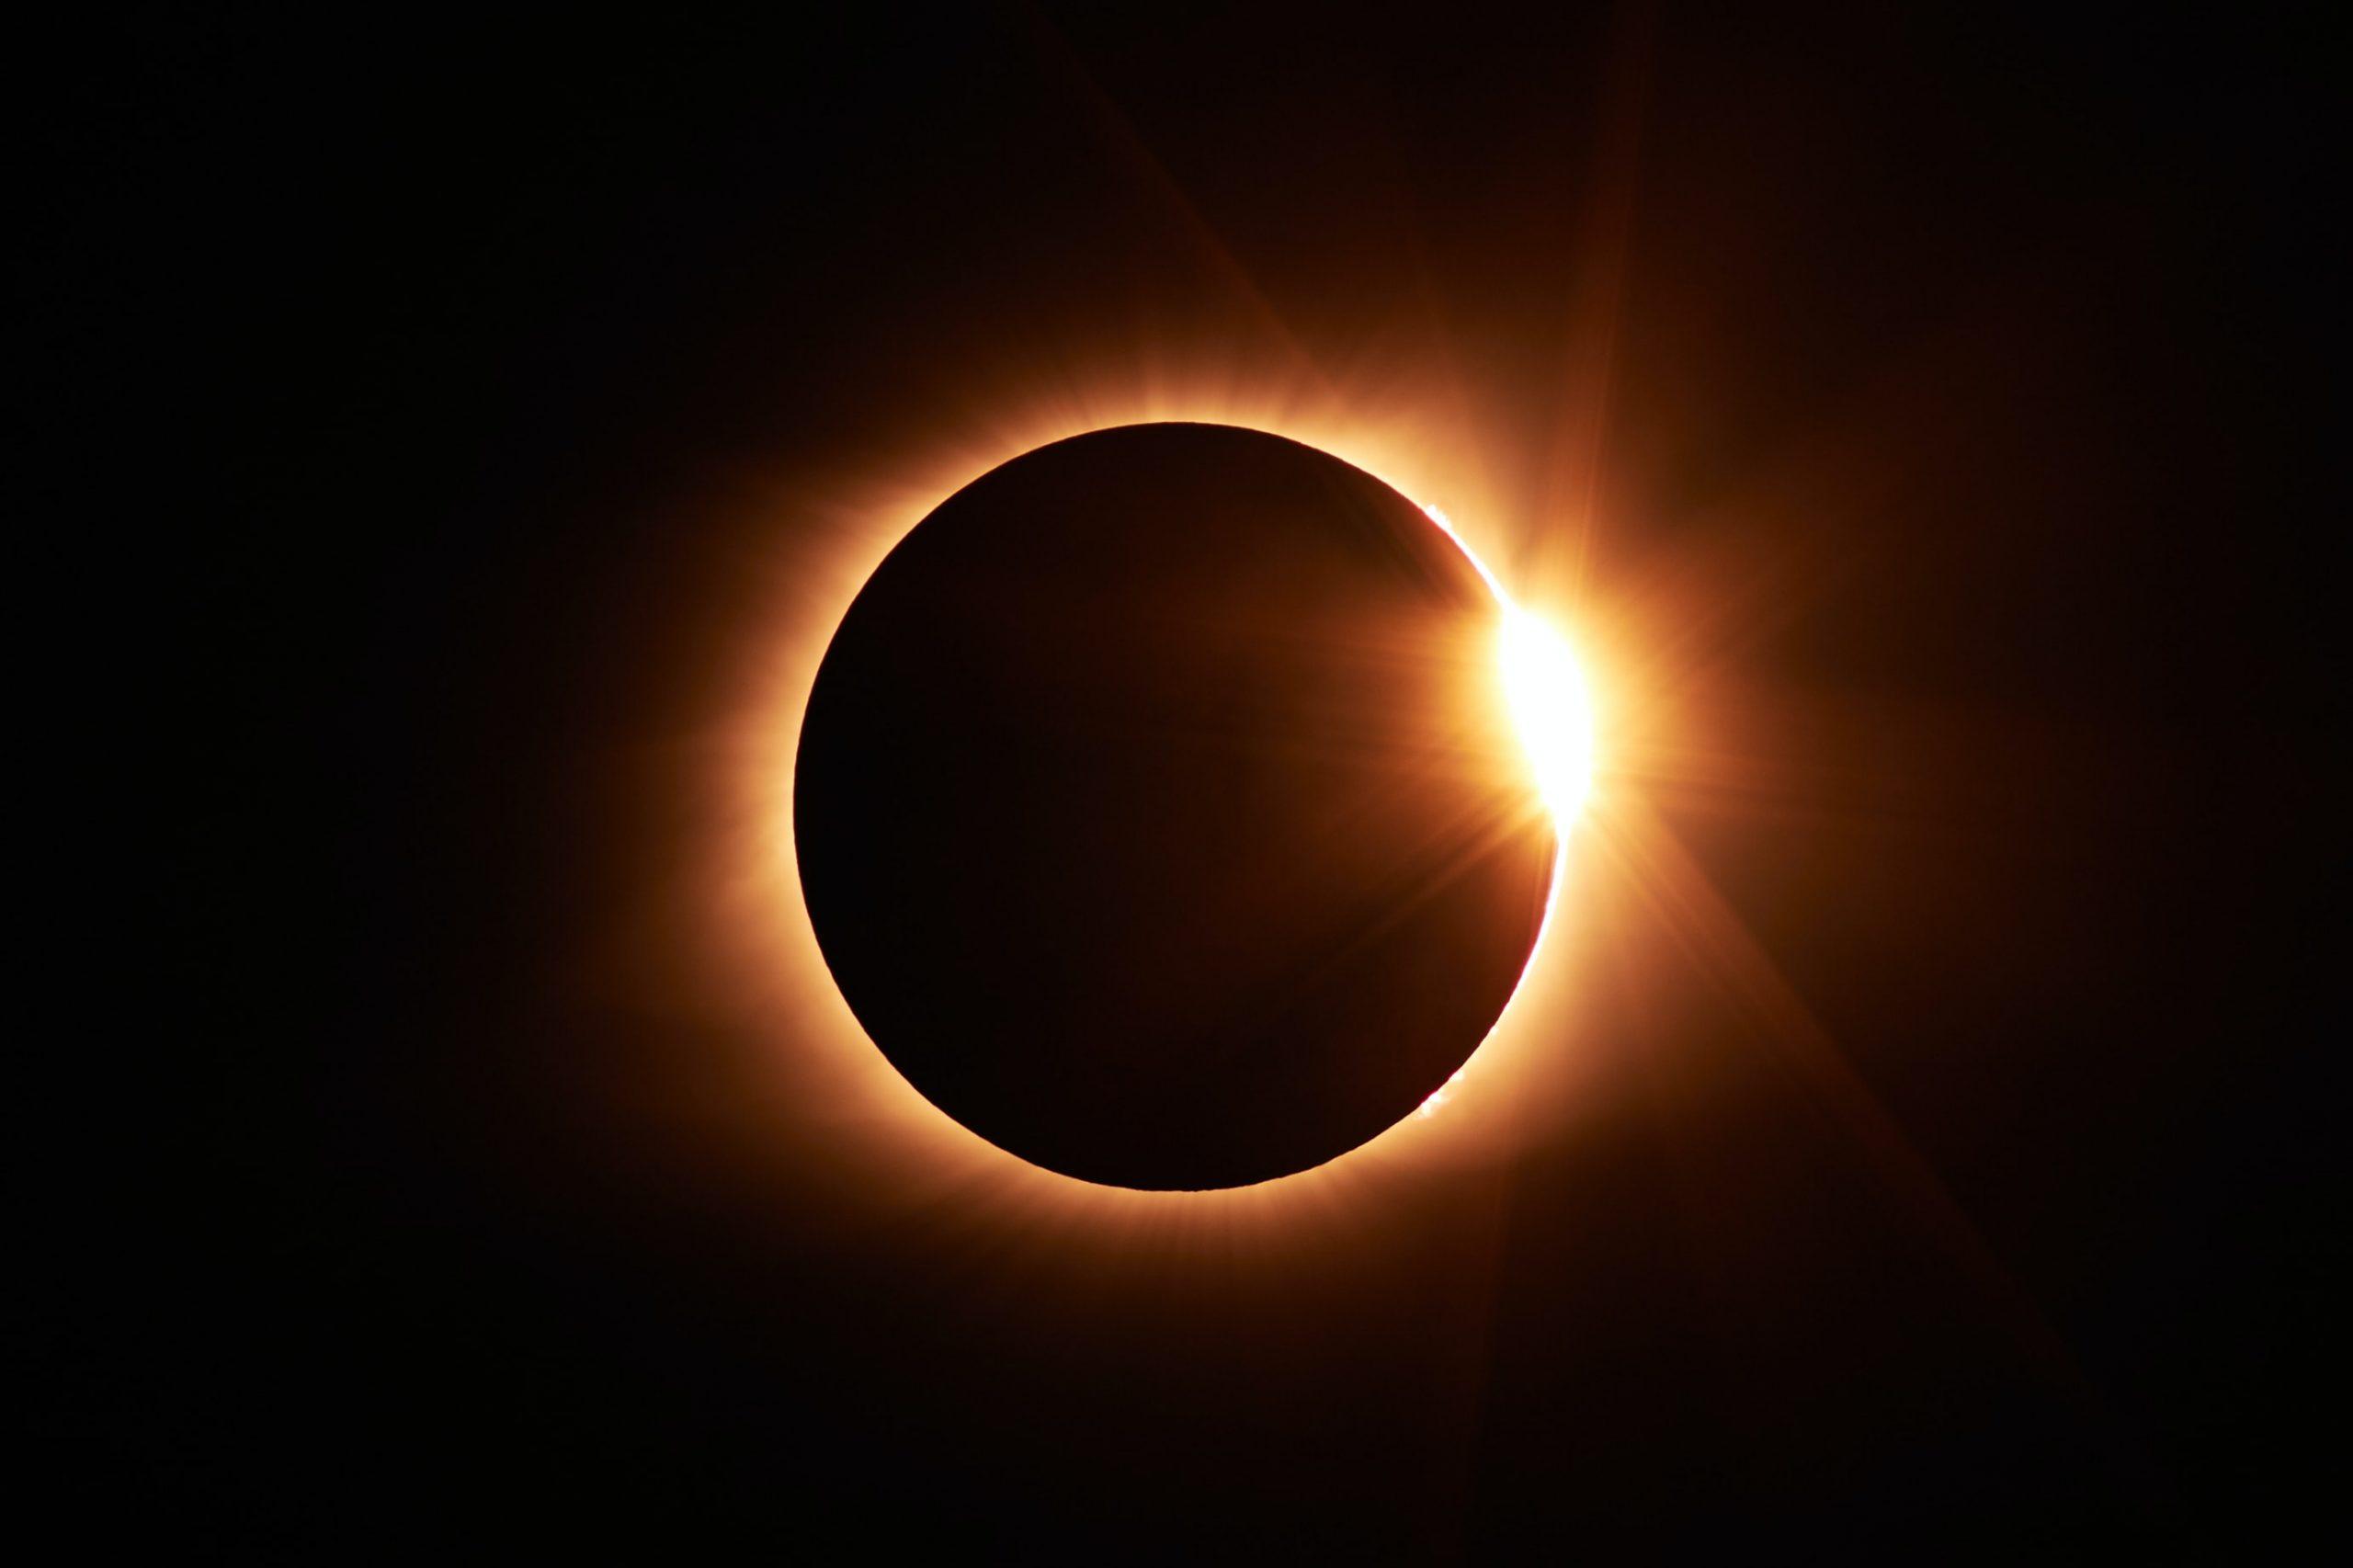 "Photo by <a href=""https://unsplash.com/@sarahleejs?utm_source=unsplash&utm_medium=referral&utm_content=creditCopyText"">Jongsun Lee</a> on <a href=""https://unsplash.com/s/photos/solar-eclipse?utm_source=unsplash&utm_medium=referral&utm_content=creditCopyText"">Unsplash</a>"